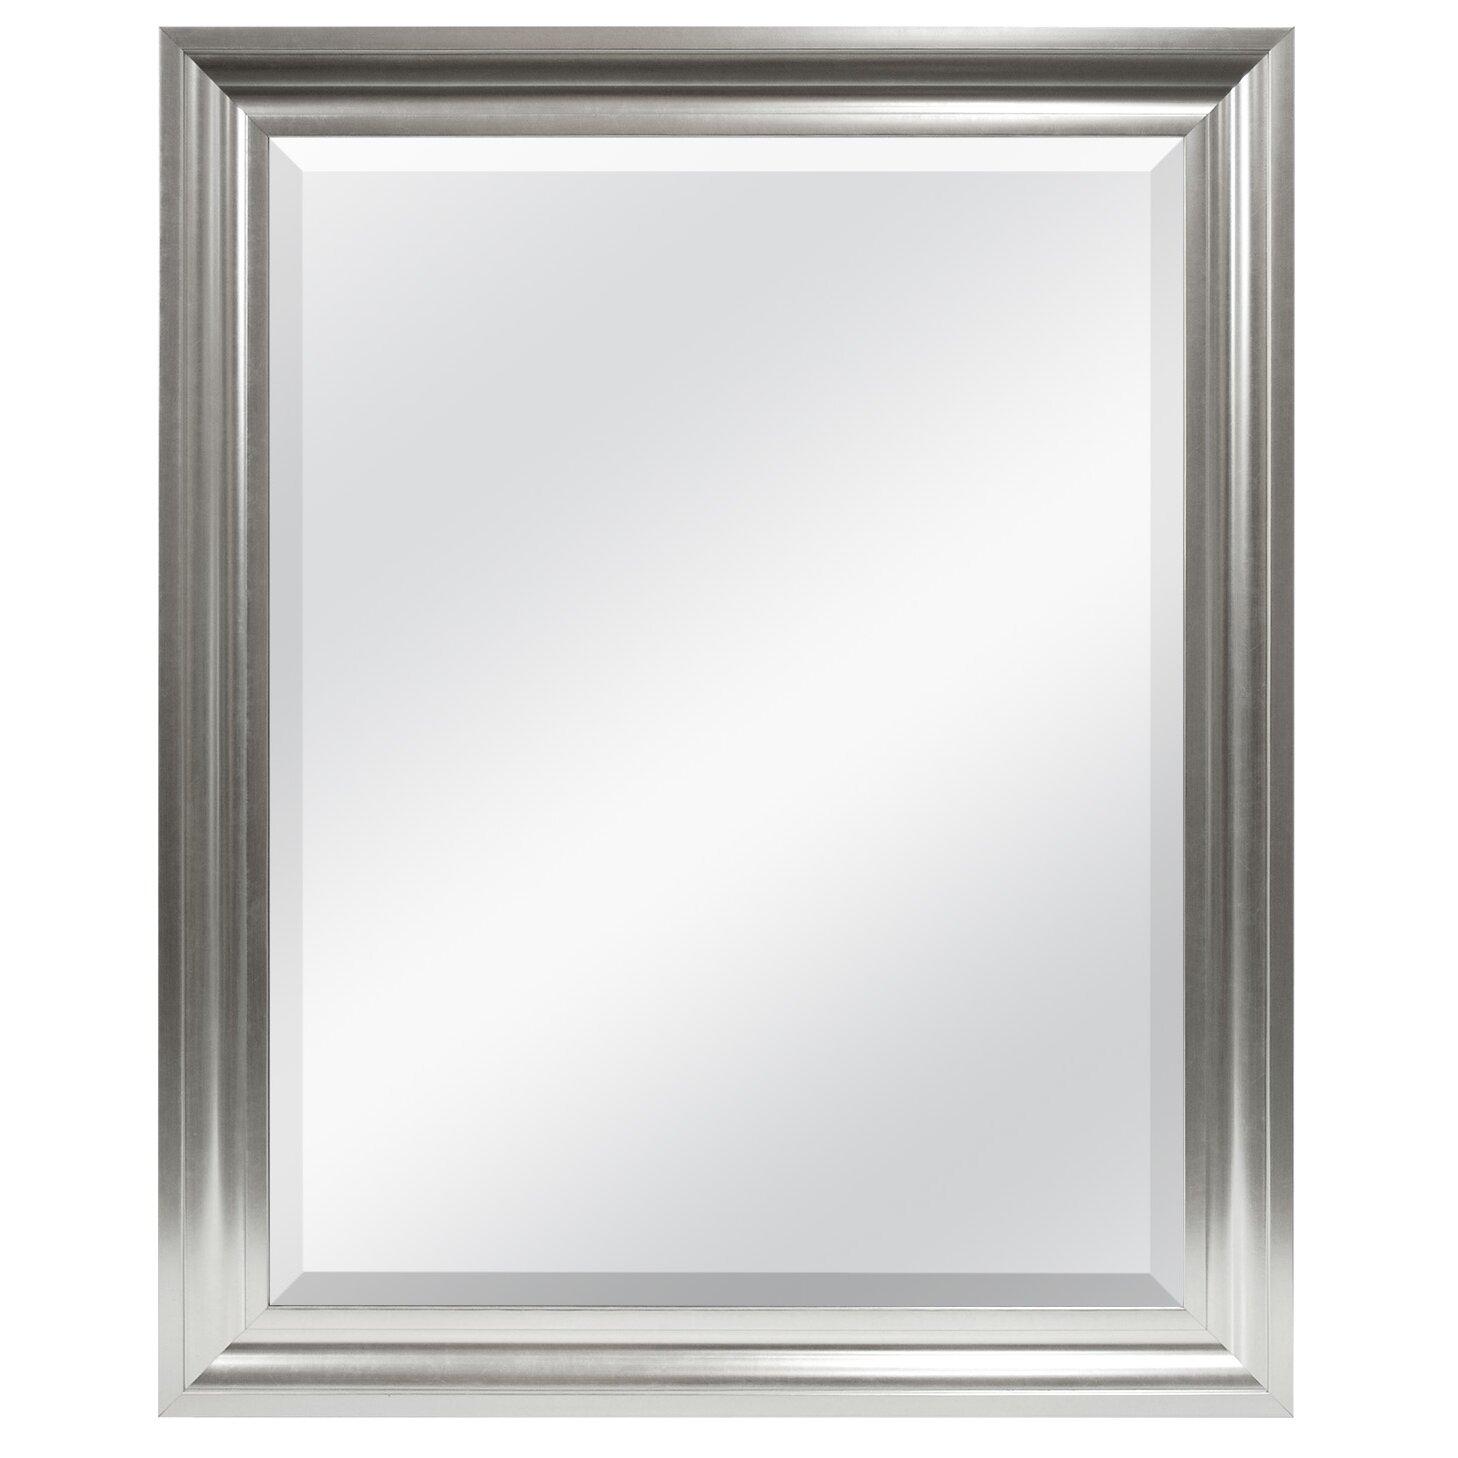 Mcsindustries beveled wall mirror reviews wayfair for Beveled mirror